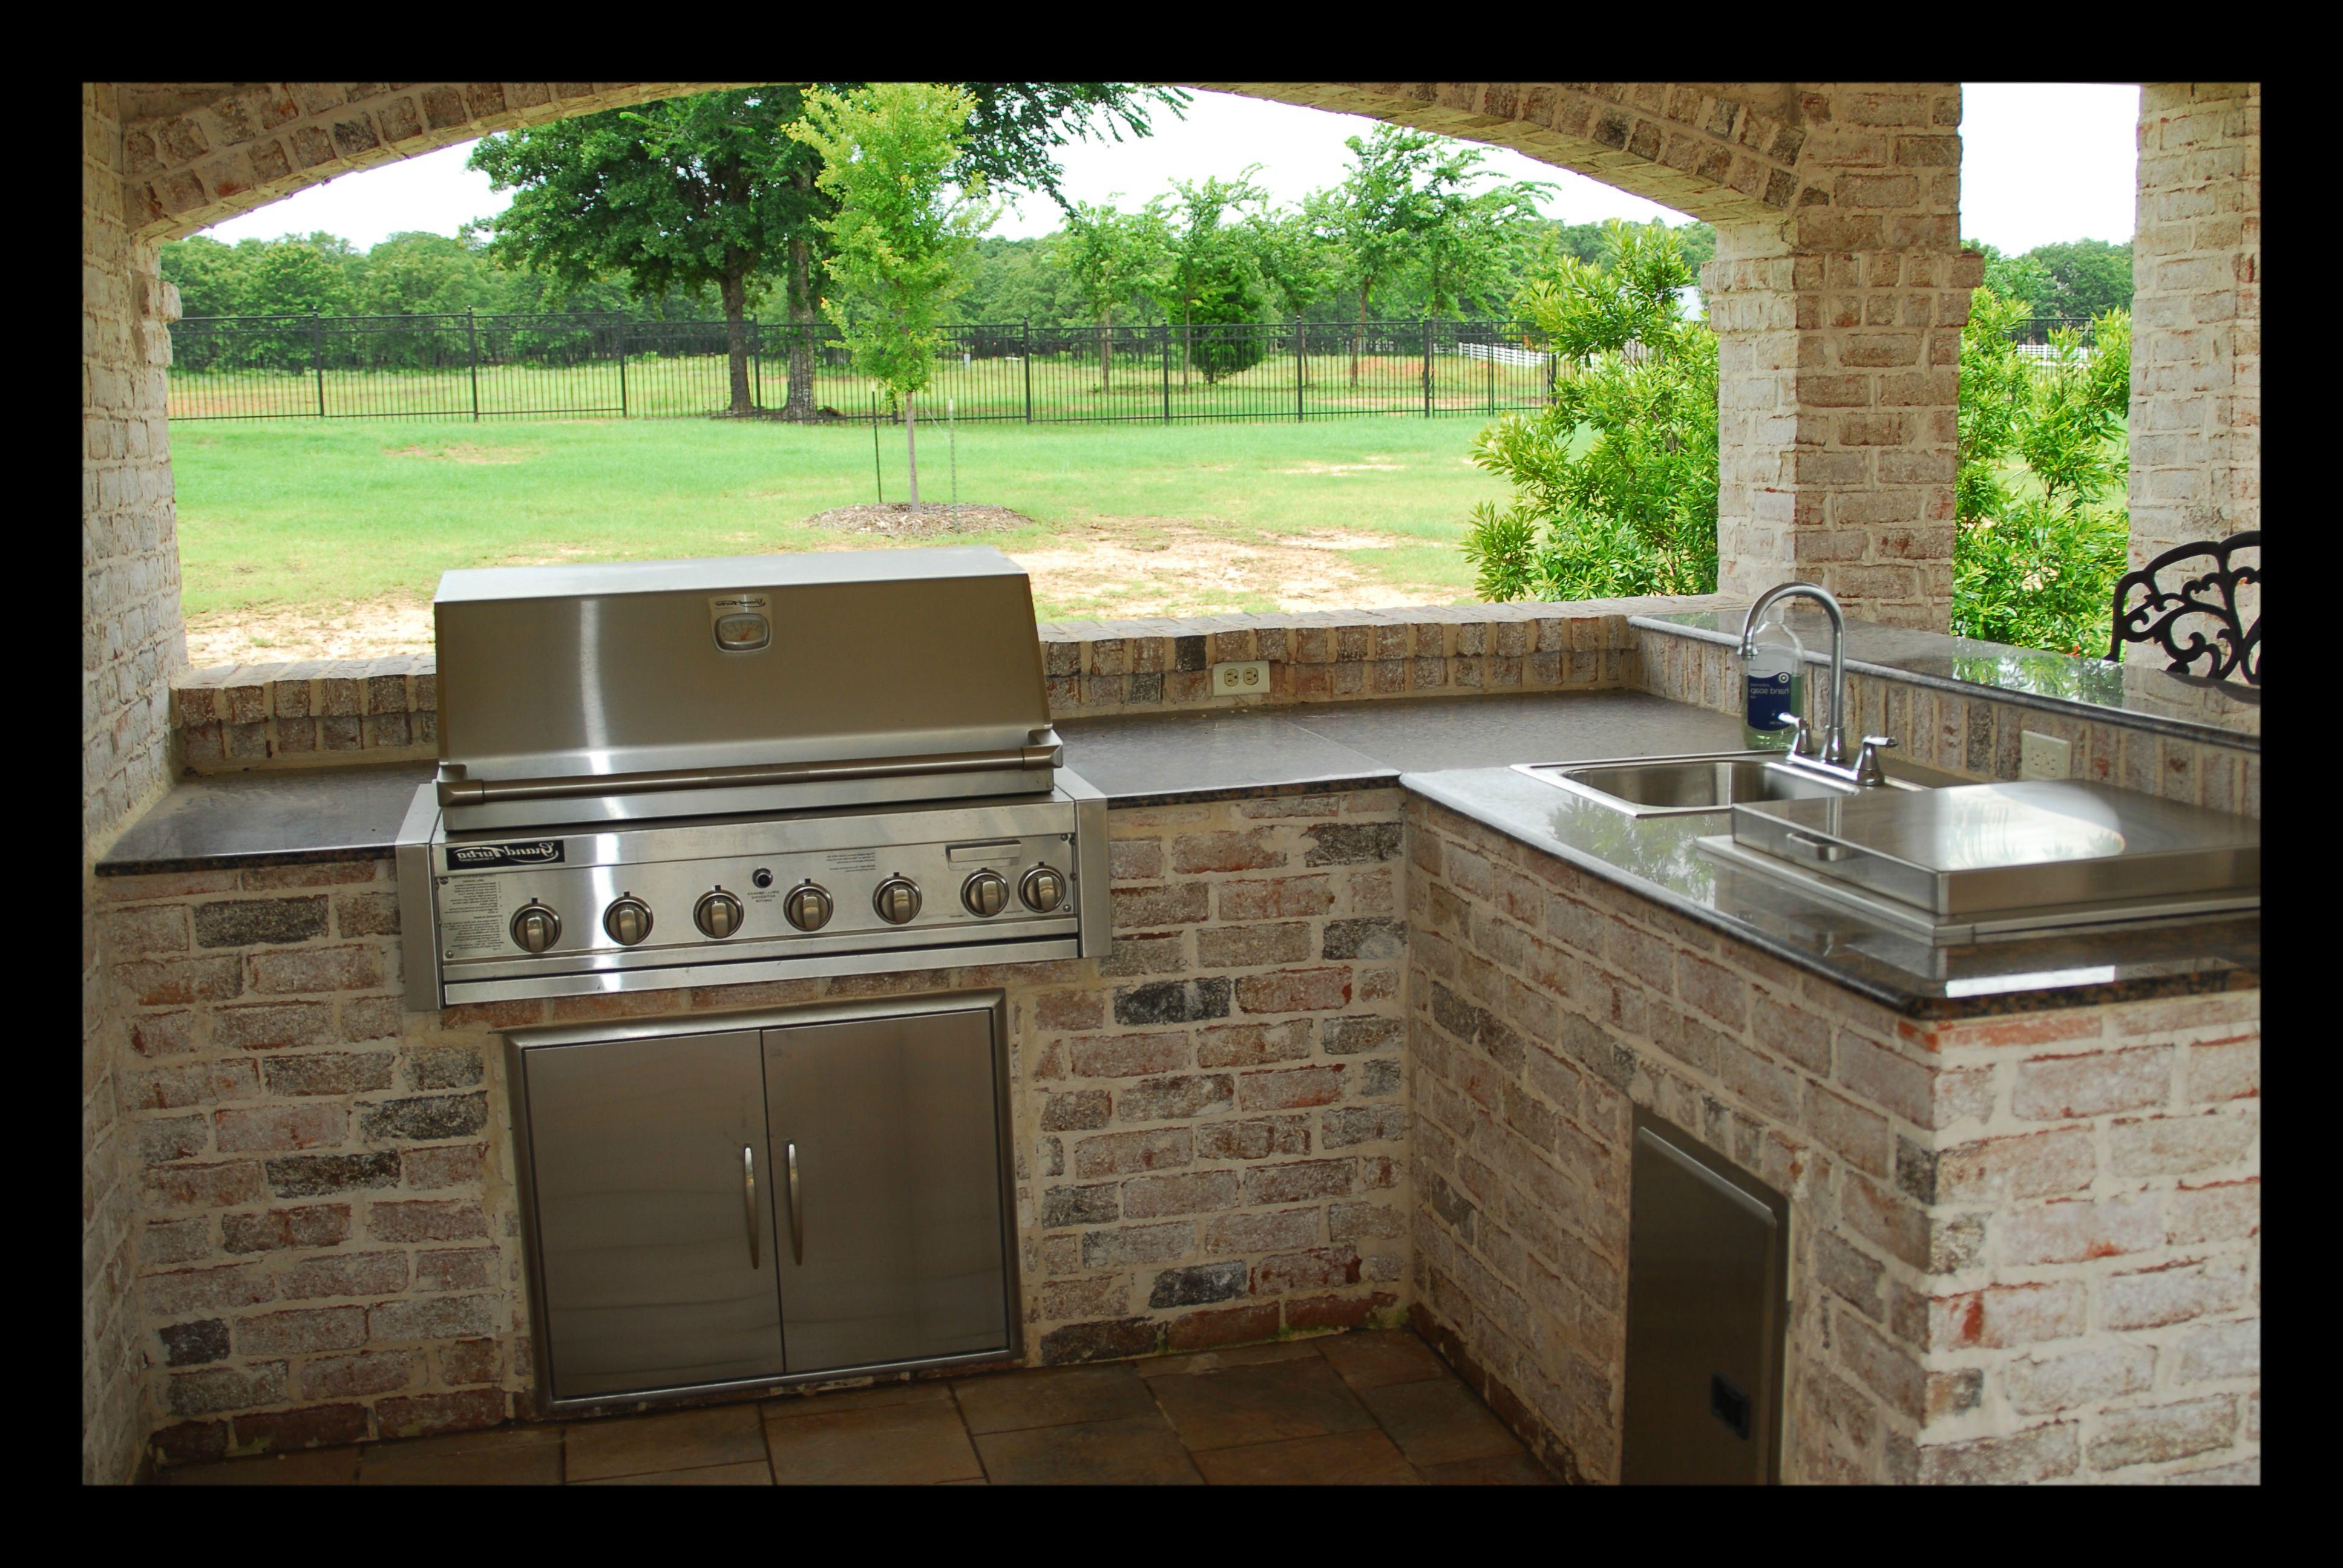 Minimalist Concrete Kitchen Countertop Ideas 4 Outdoor Kitchen Outdoor Kitchen Countertops Outdoor Kitchen Design